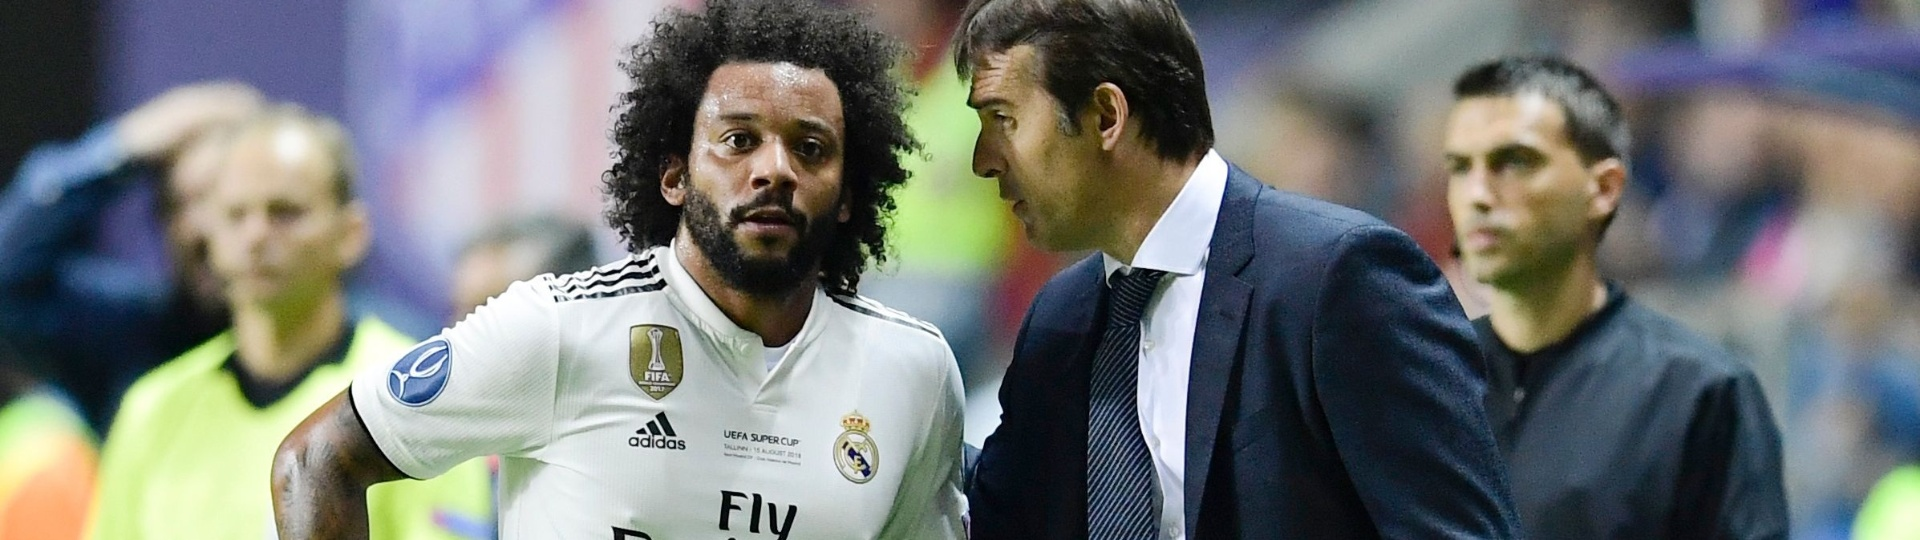 Julen Lopetegui, técnico do Real Madrid, dá instruções ao lateral Marcelo na Supercopa da Europa